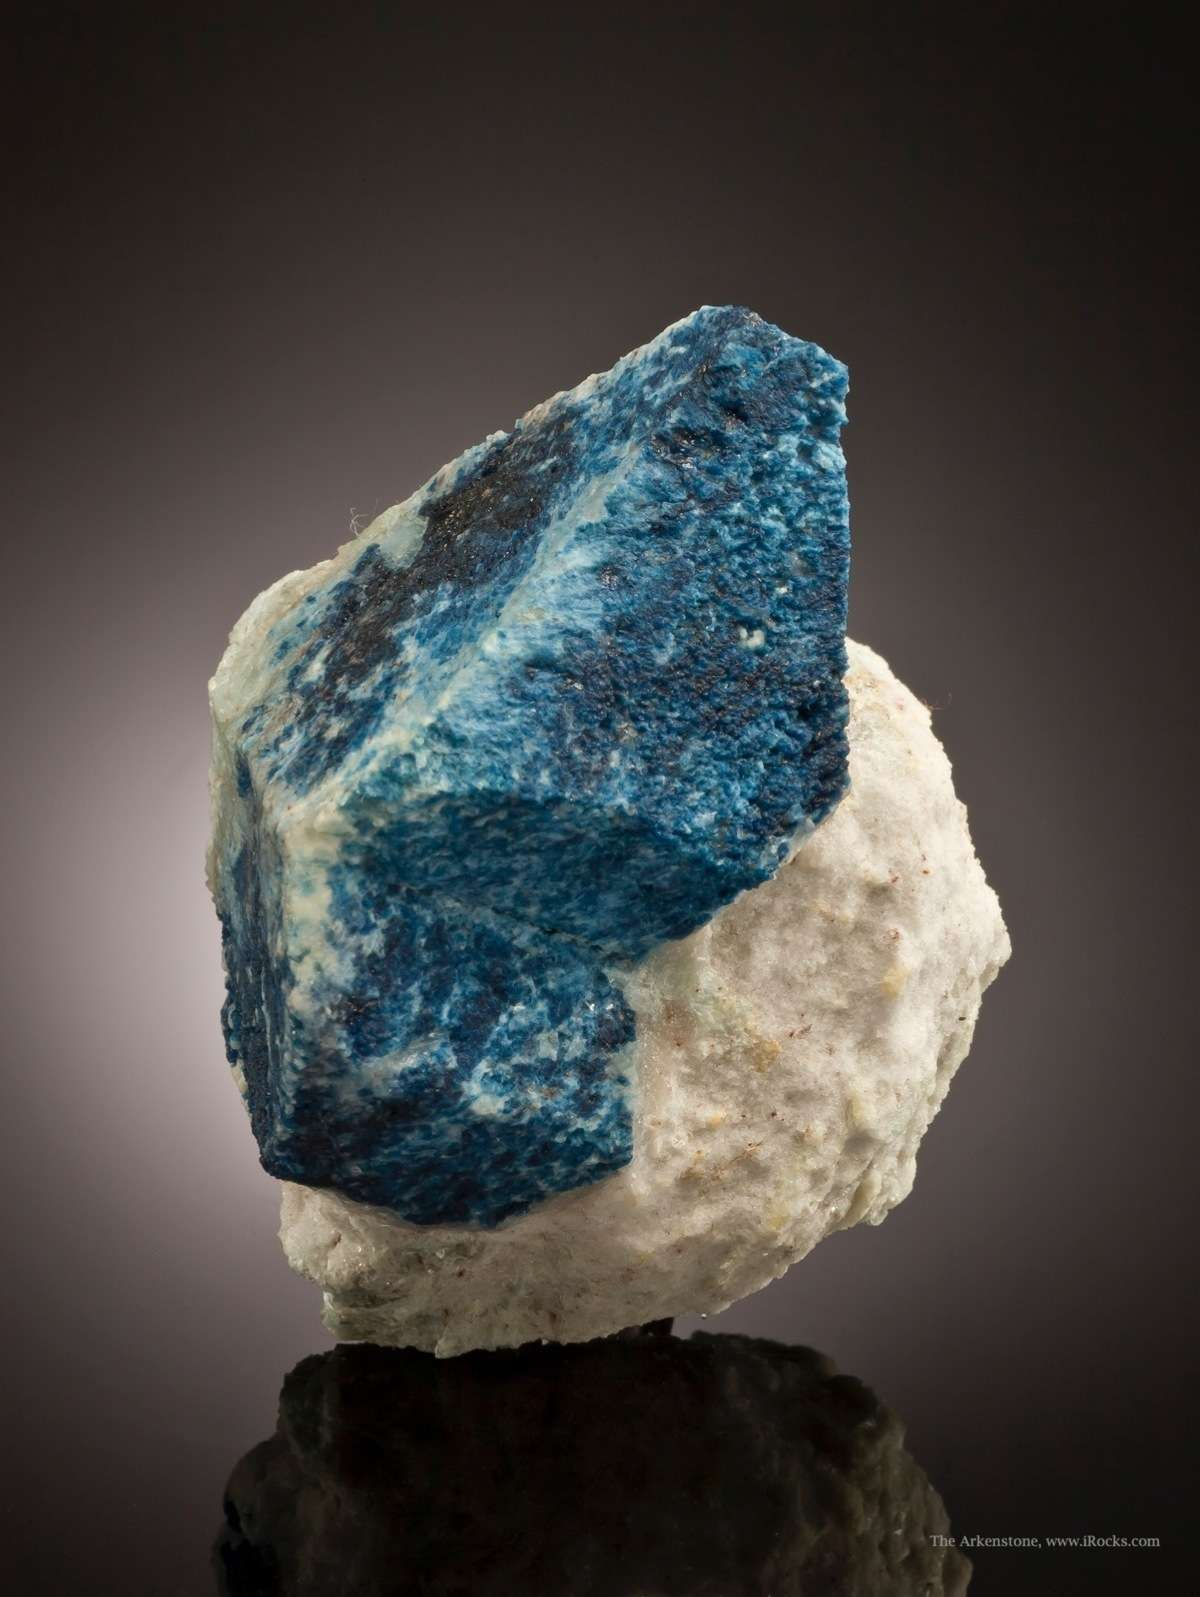 Lazulite Kyanite Rough Georgia Top Quality Collector Slabs Pyrite in Quartz Matrix from Graves Mountain